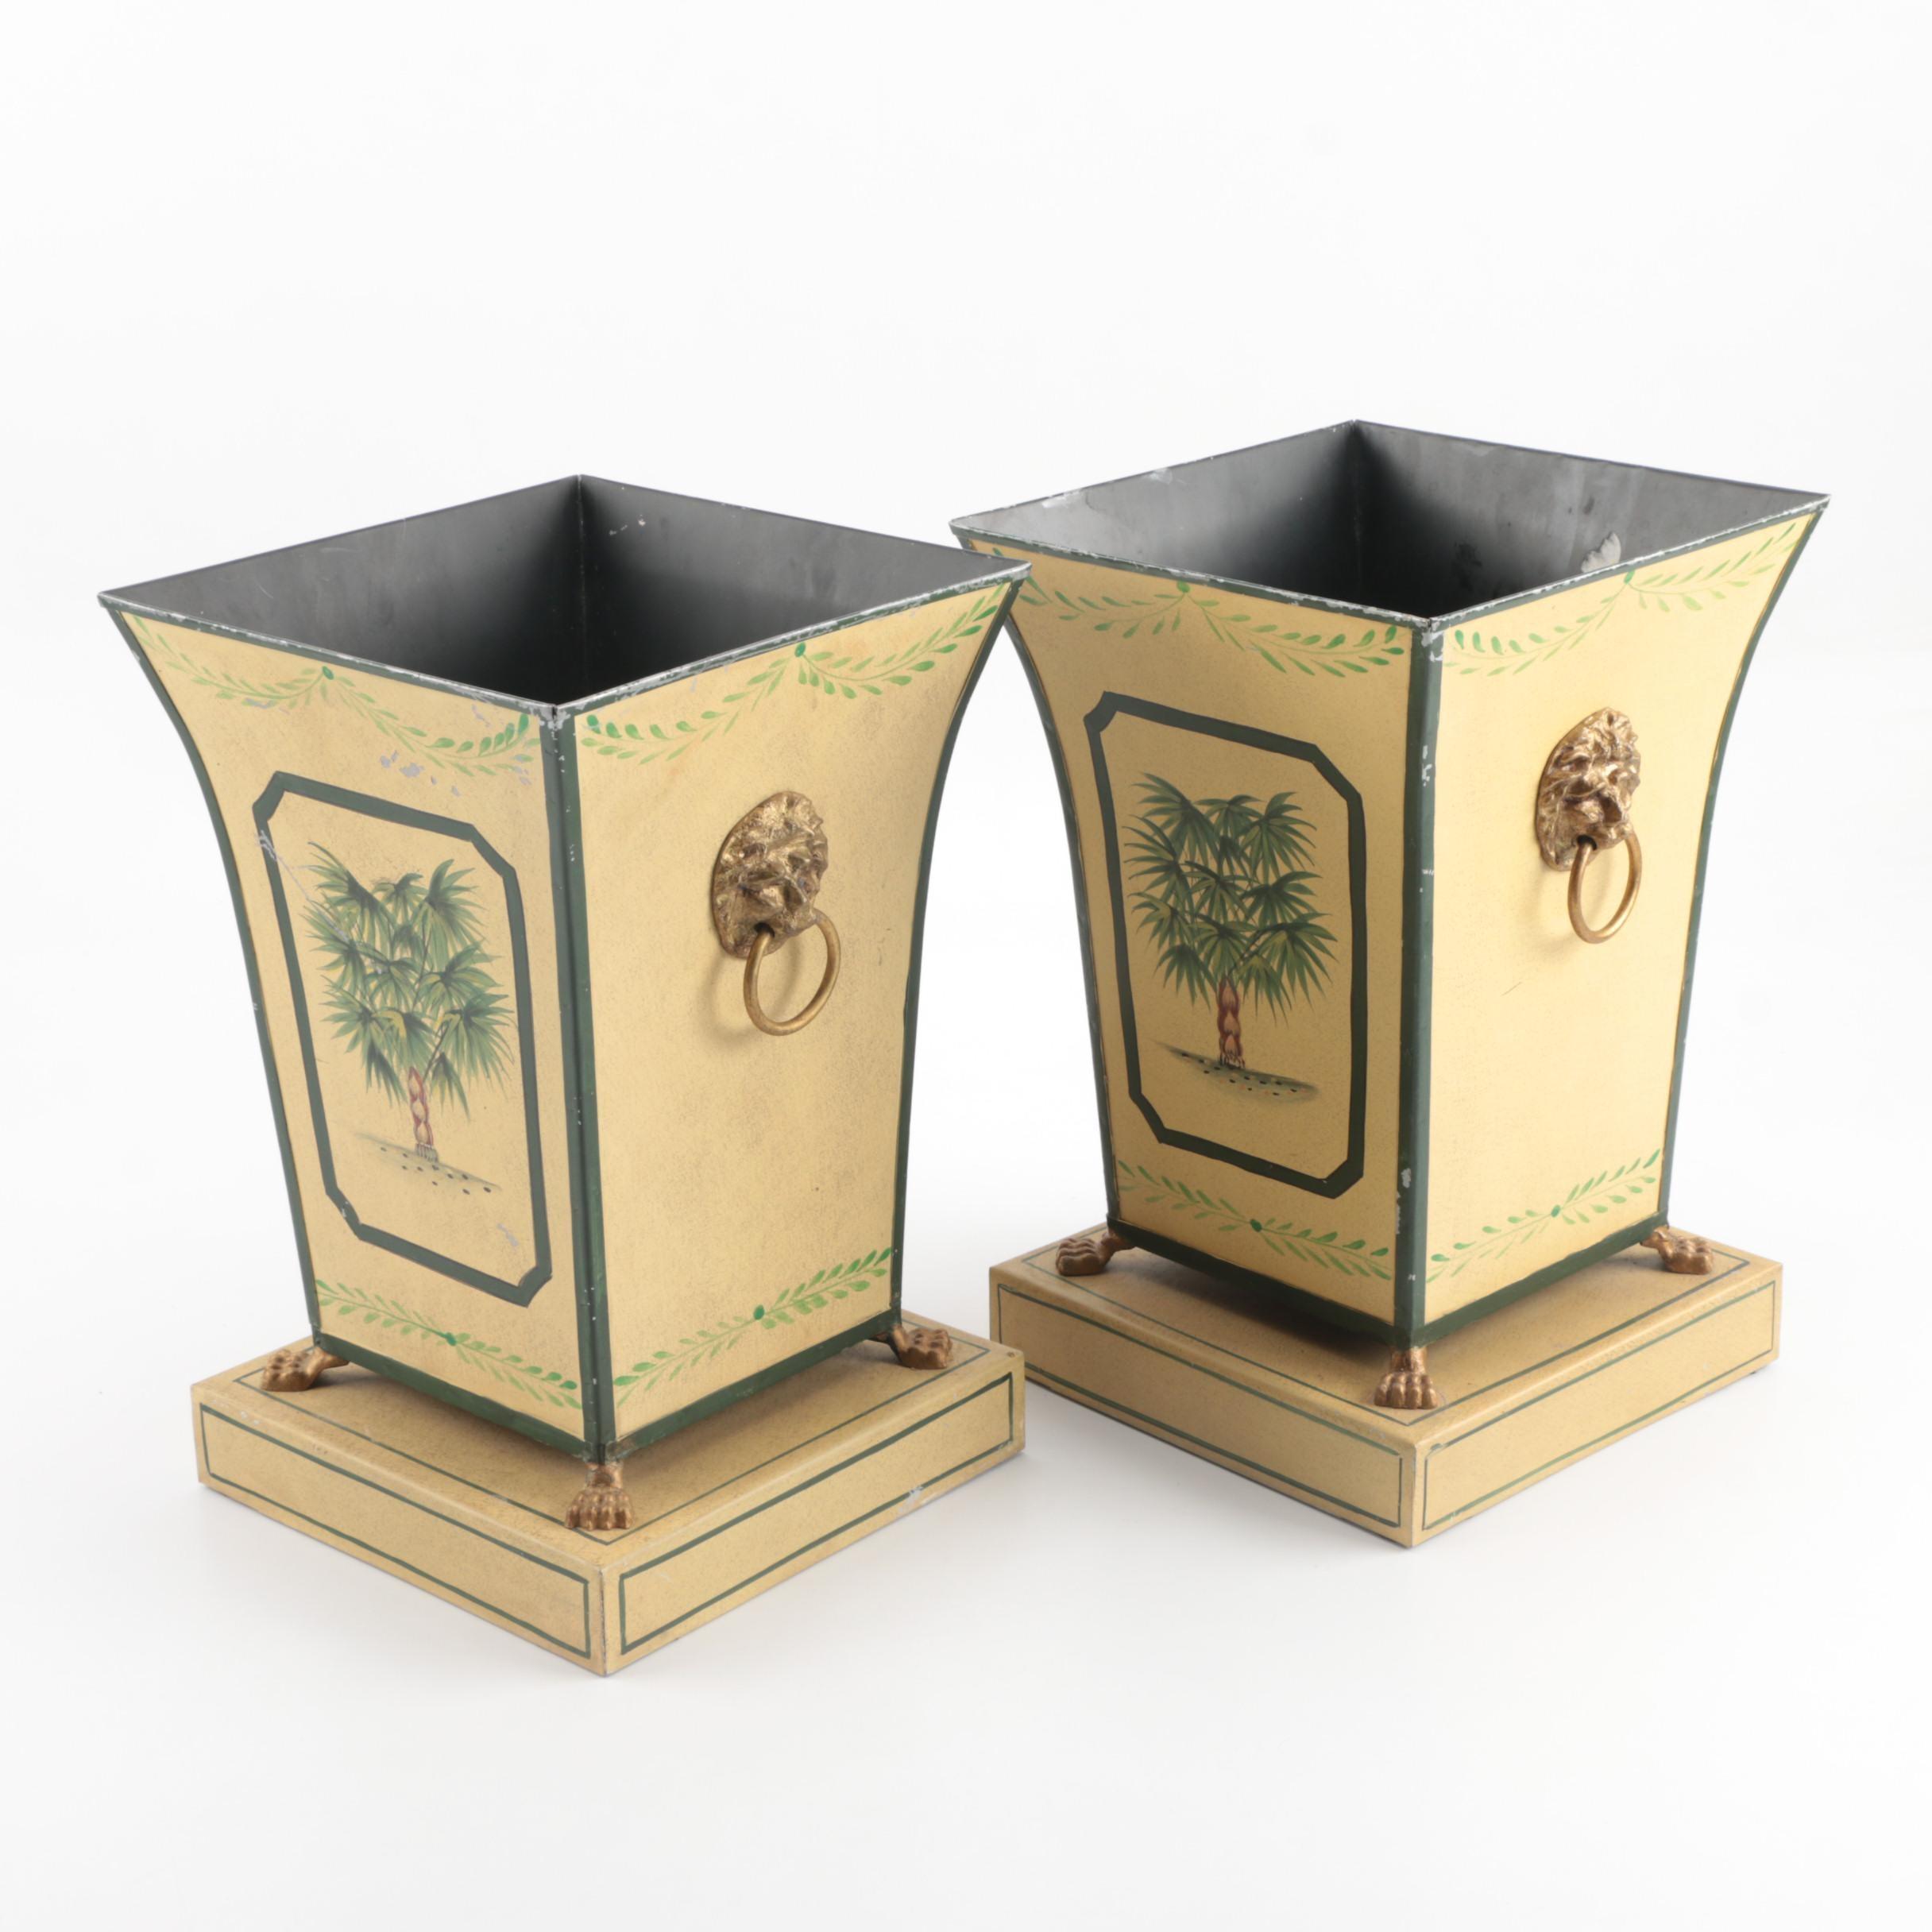 Decorative Metal Planters